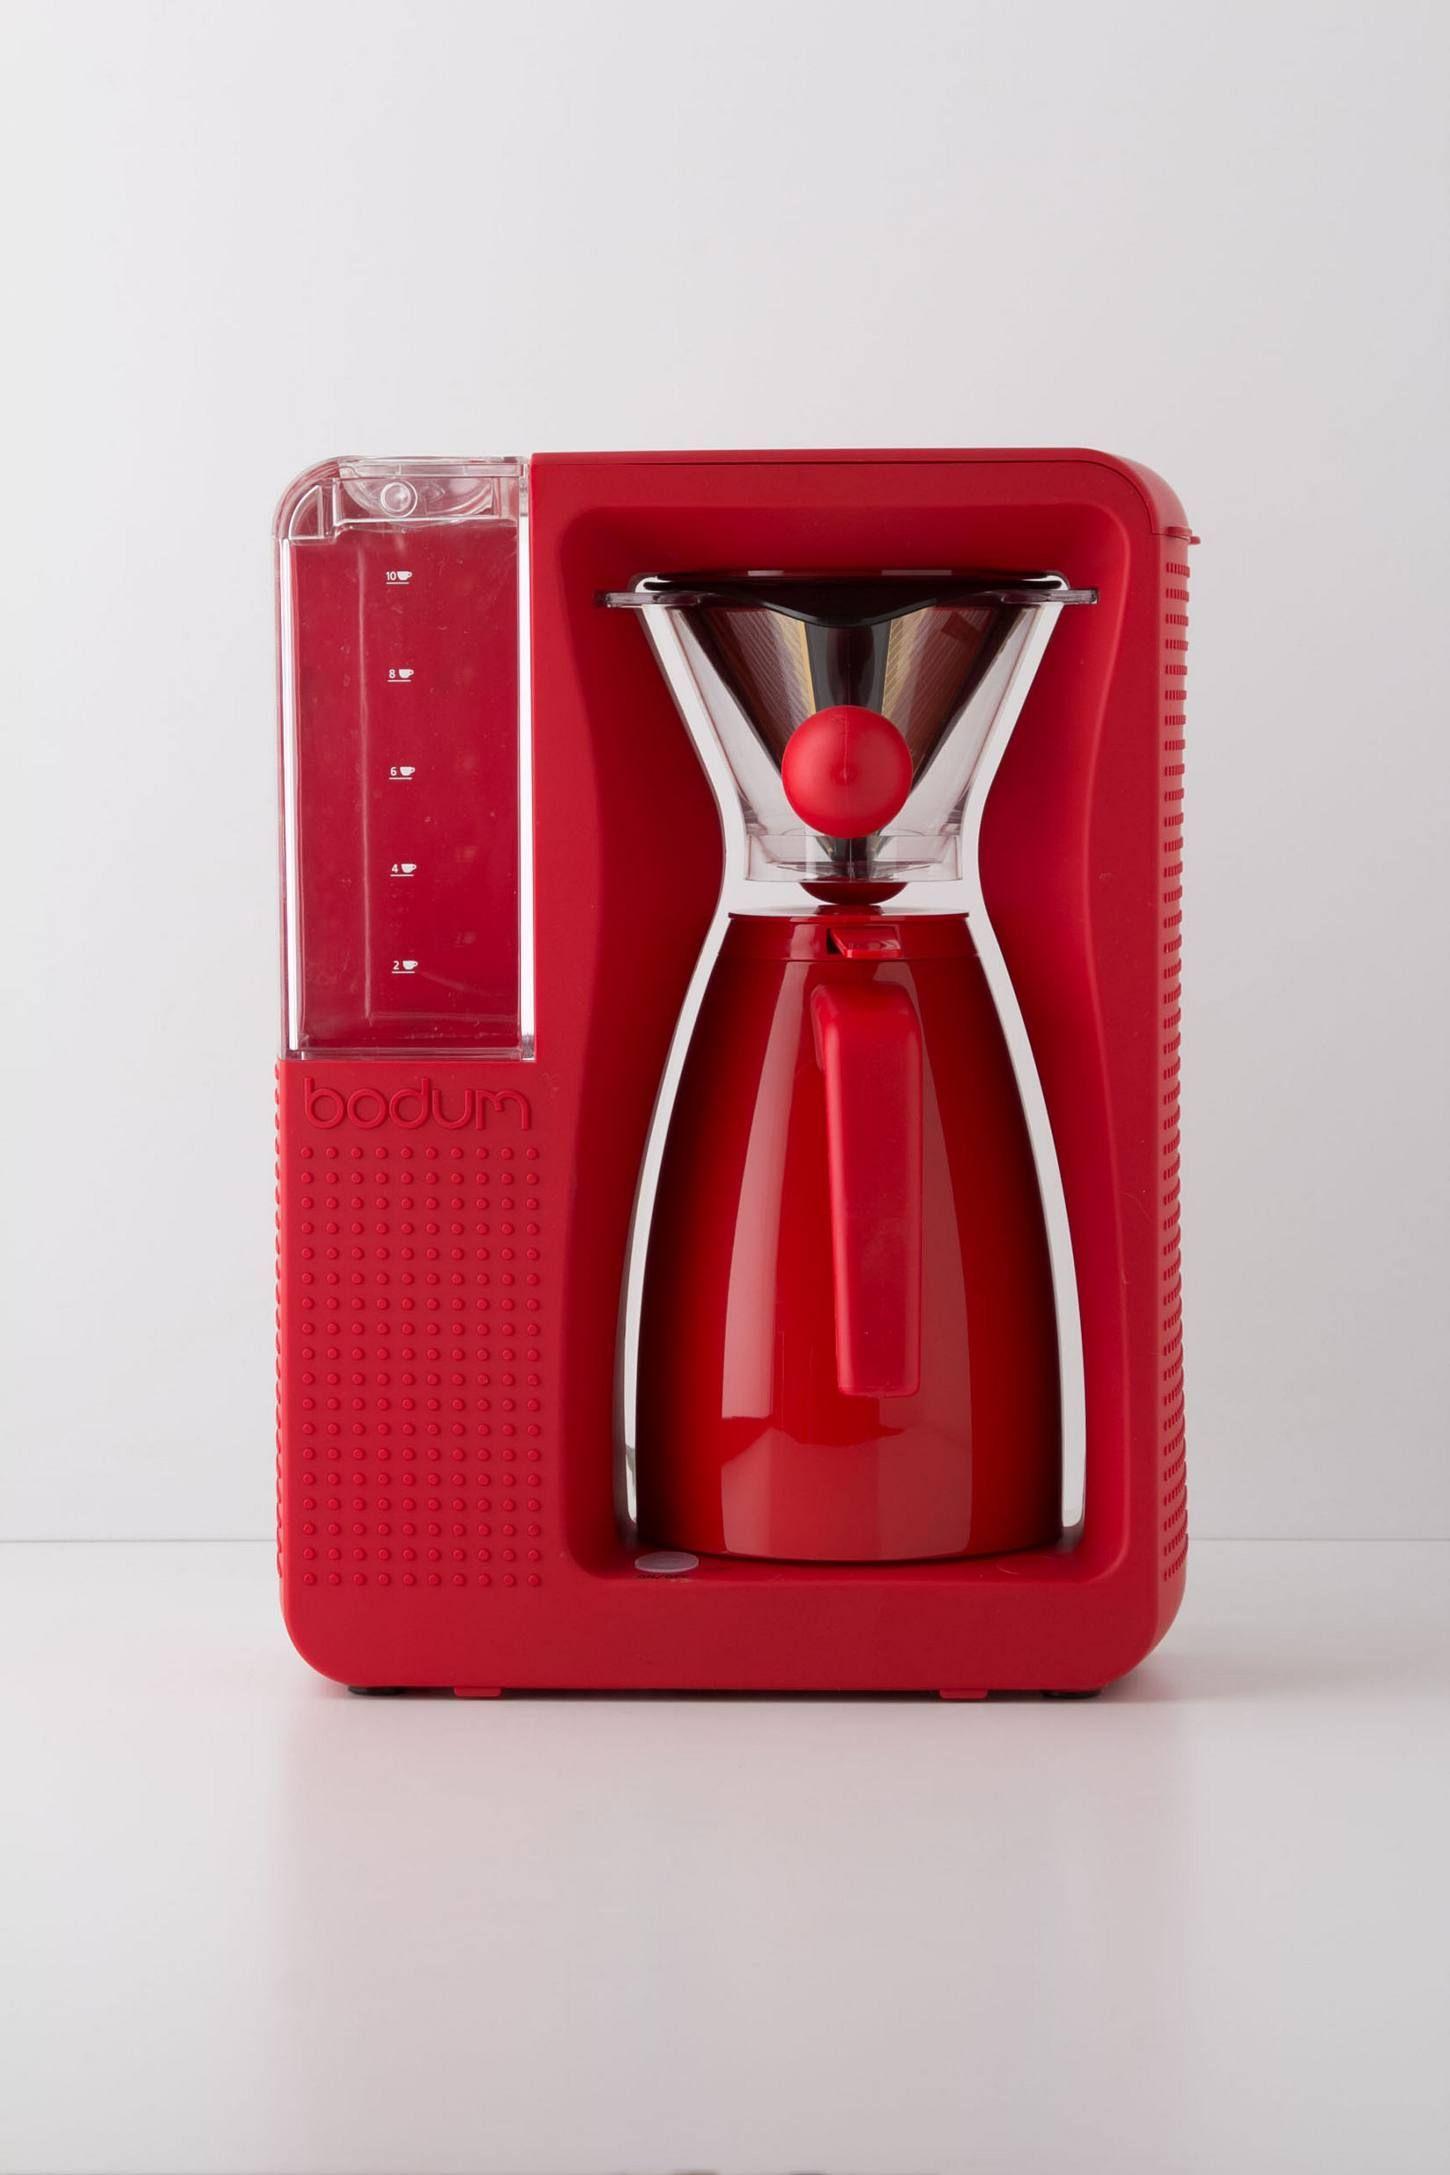 Bodum bistro brew coffee maker coffee maker coffee